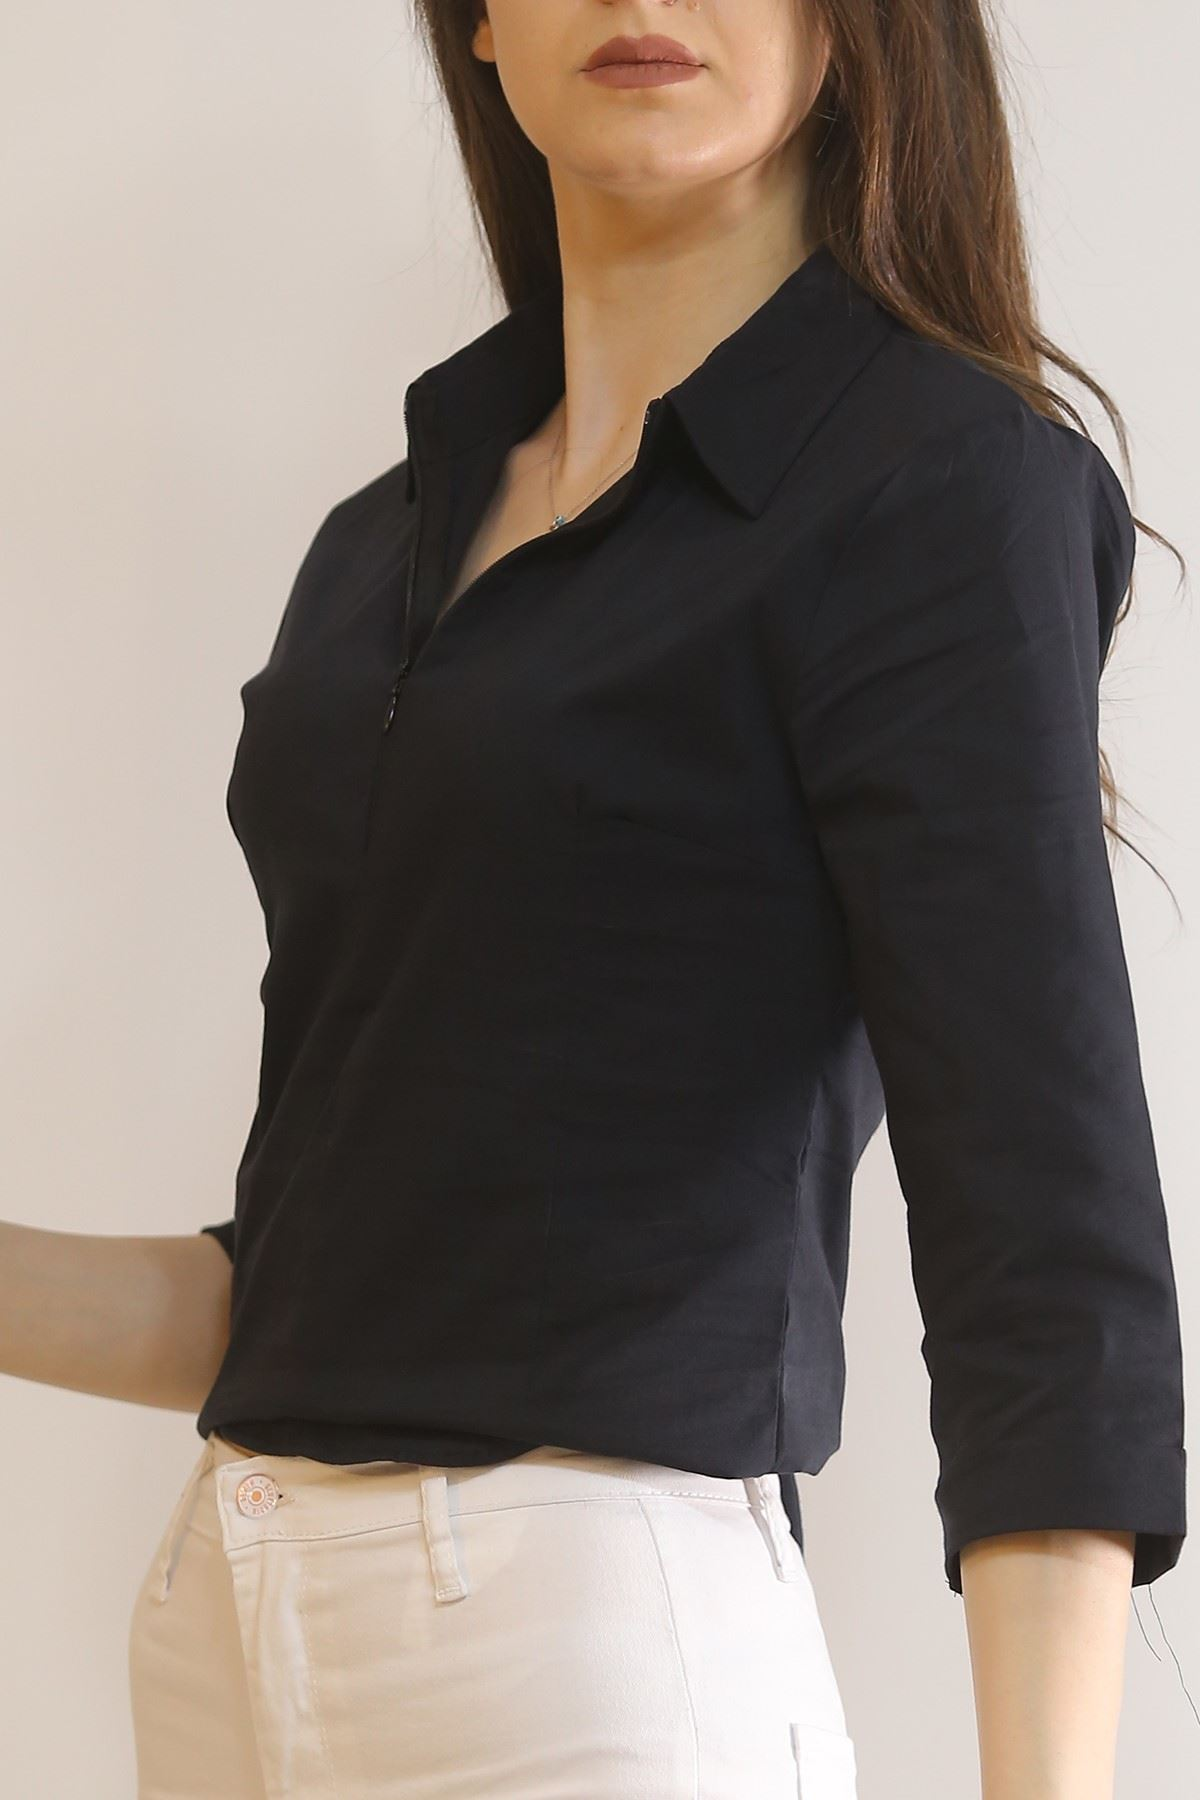 Likralı Slim Fit Gömlek Siyah - 2315.159.